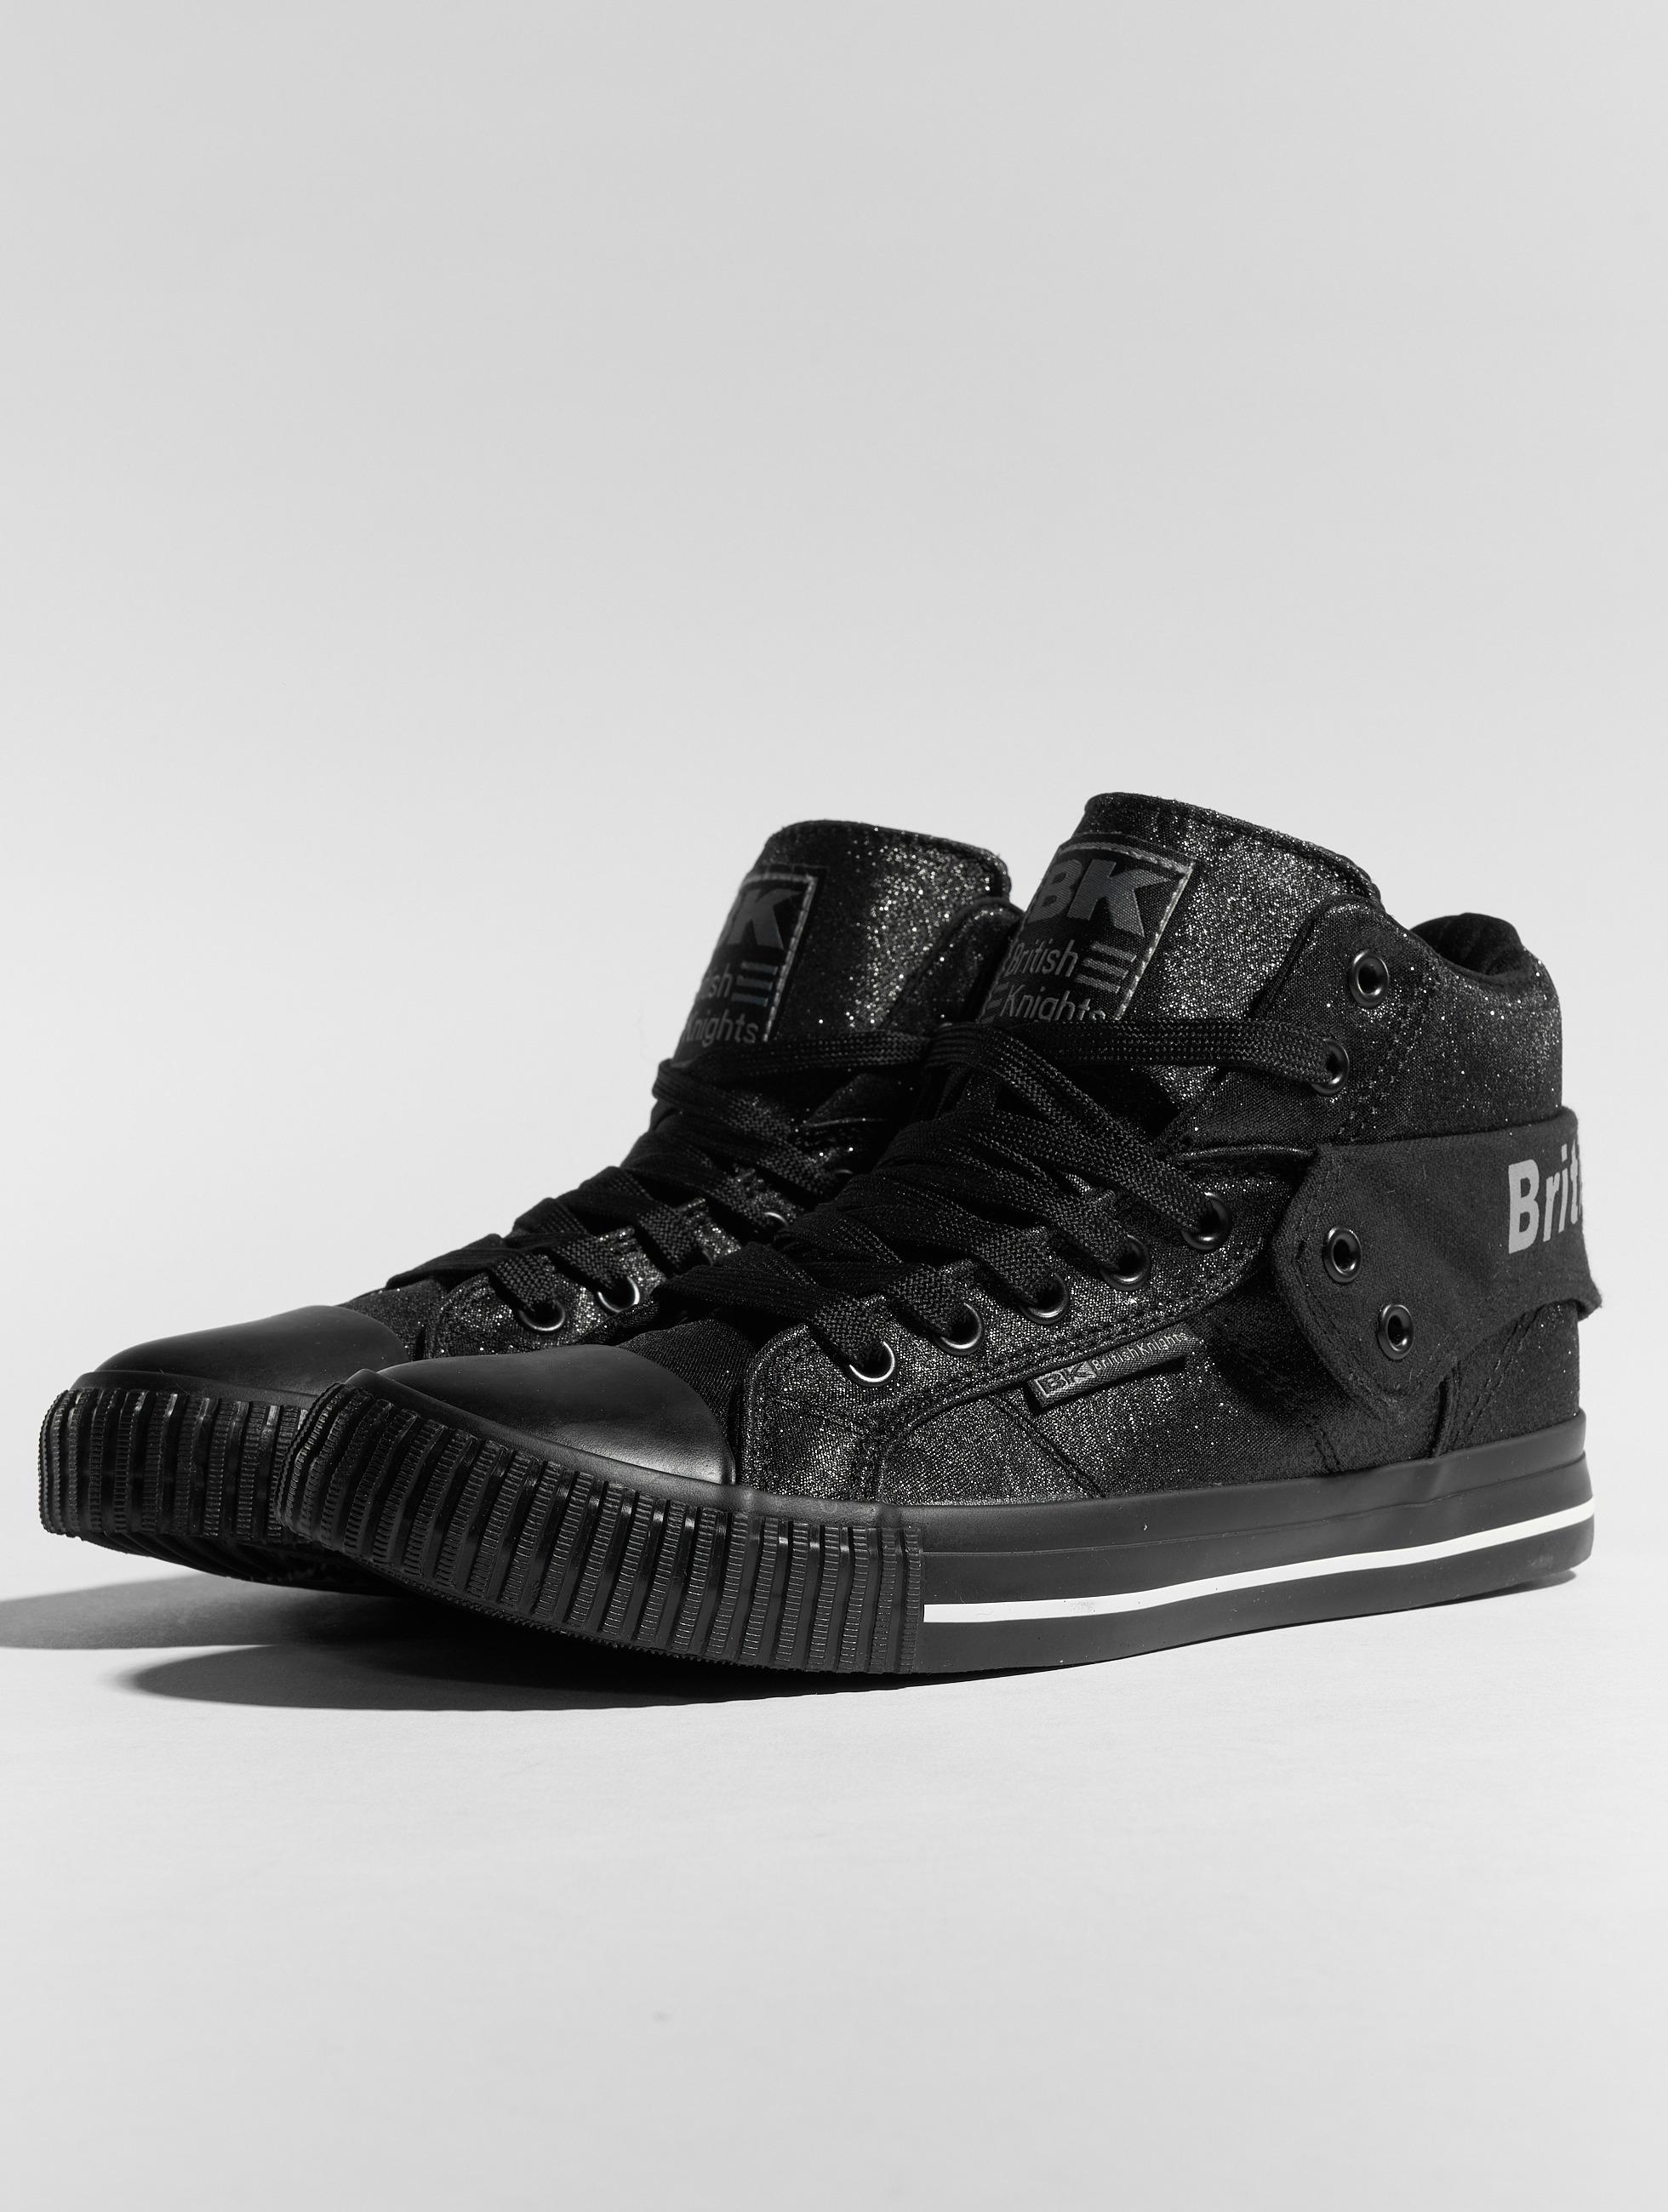 British British Knights Blackblack Roco Knights Roco Blackblack British Sneakers Knights Sneakers Roco 8wnNm0v